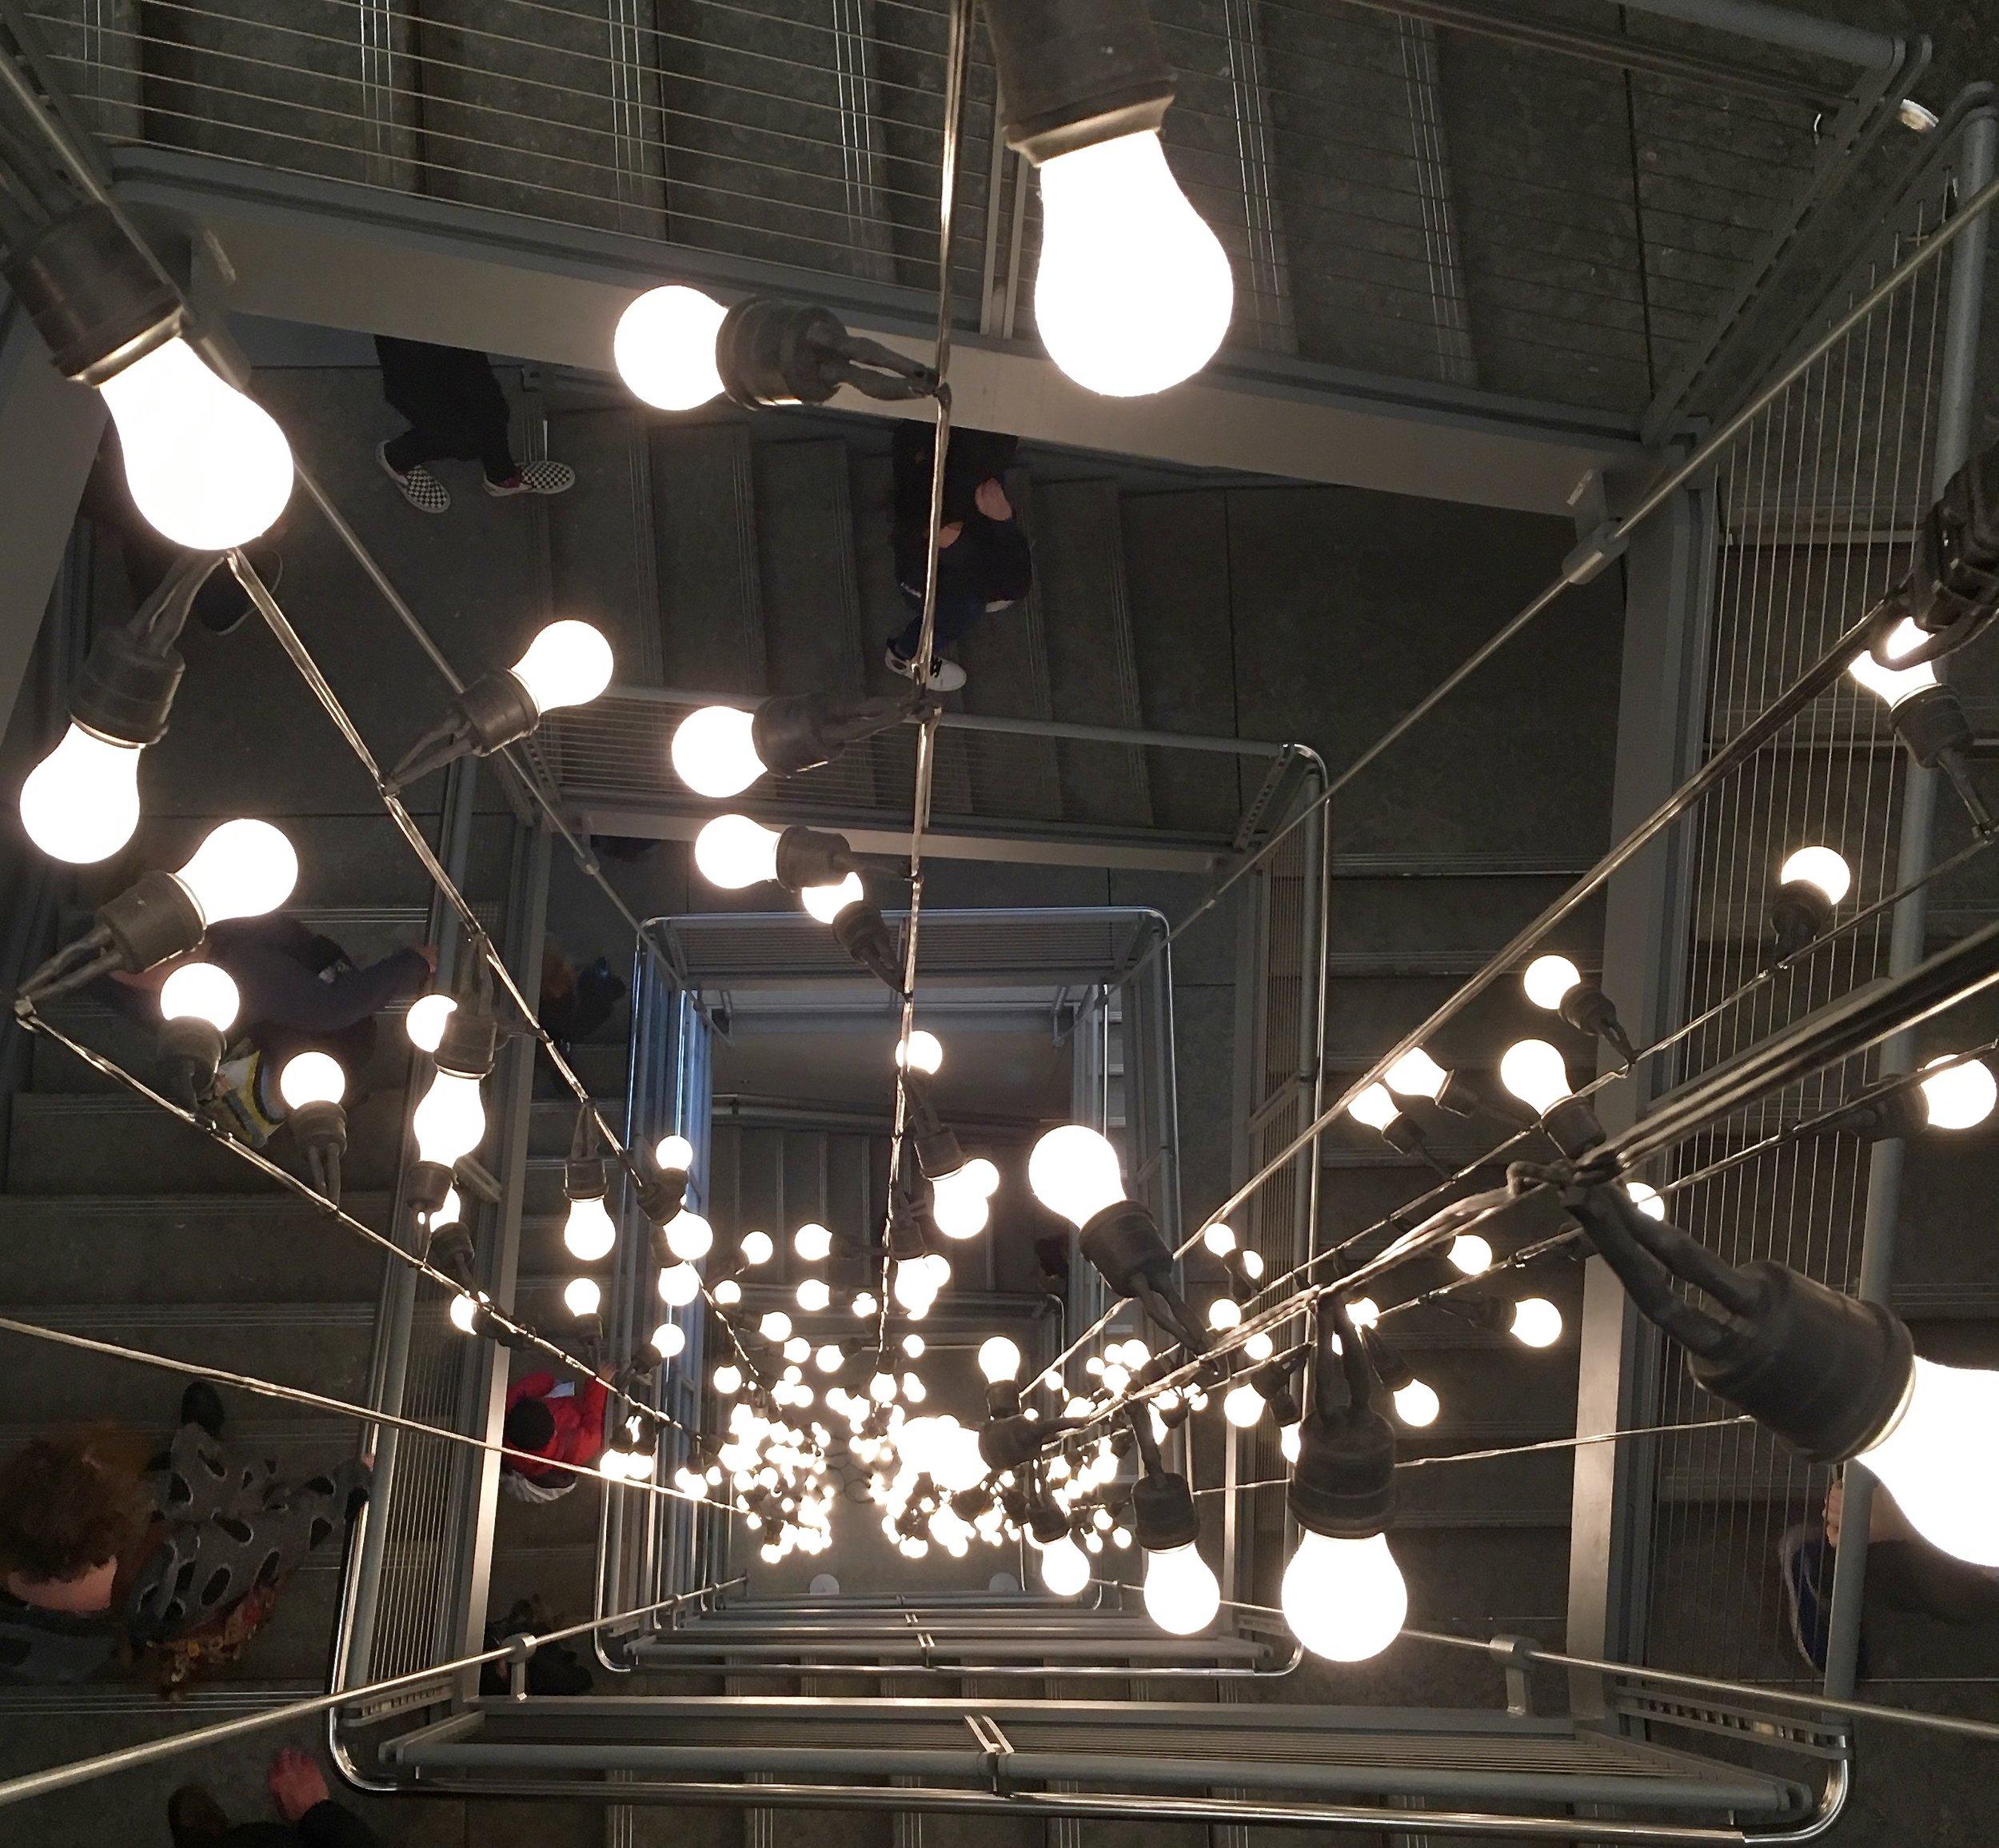 Felix Gonzalez-Toress - Whitney Museum